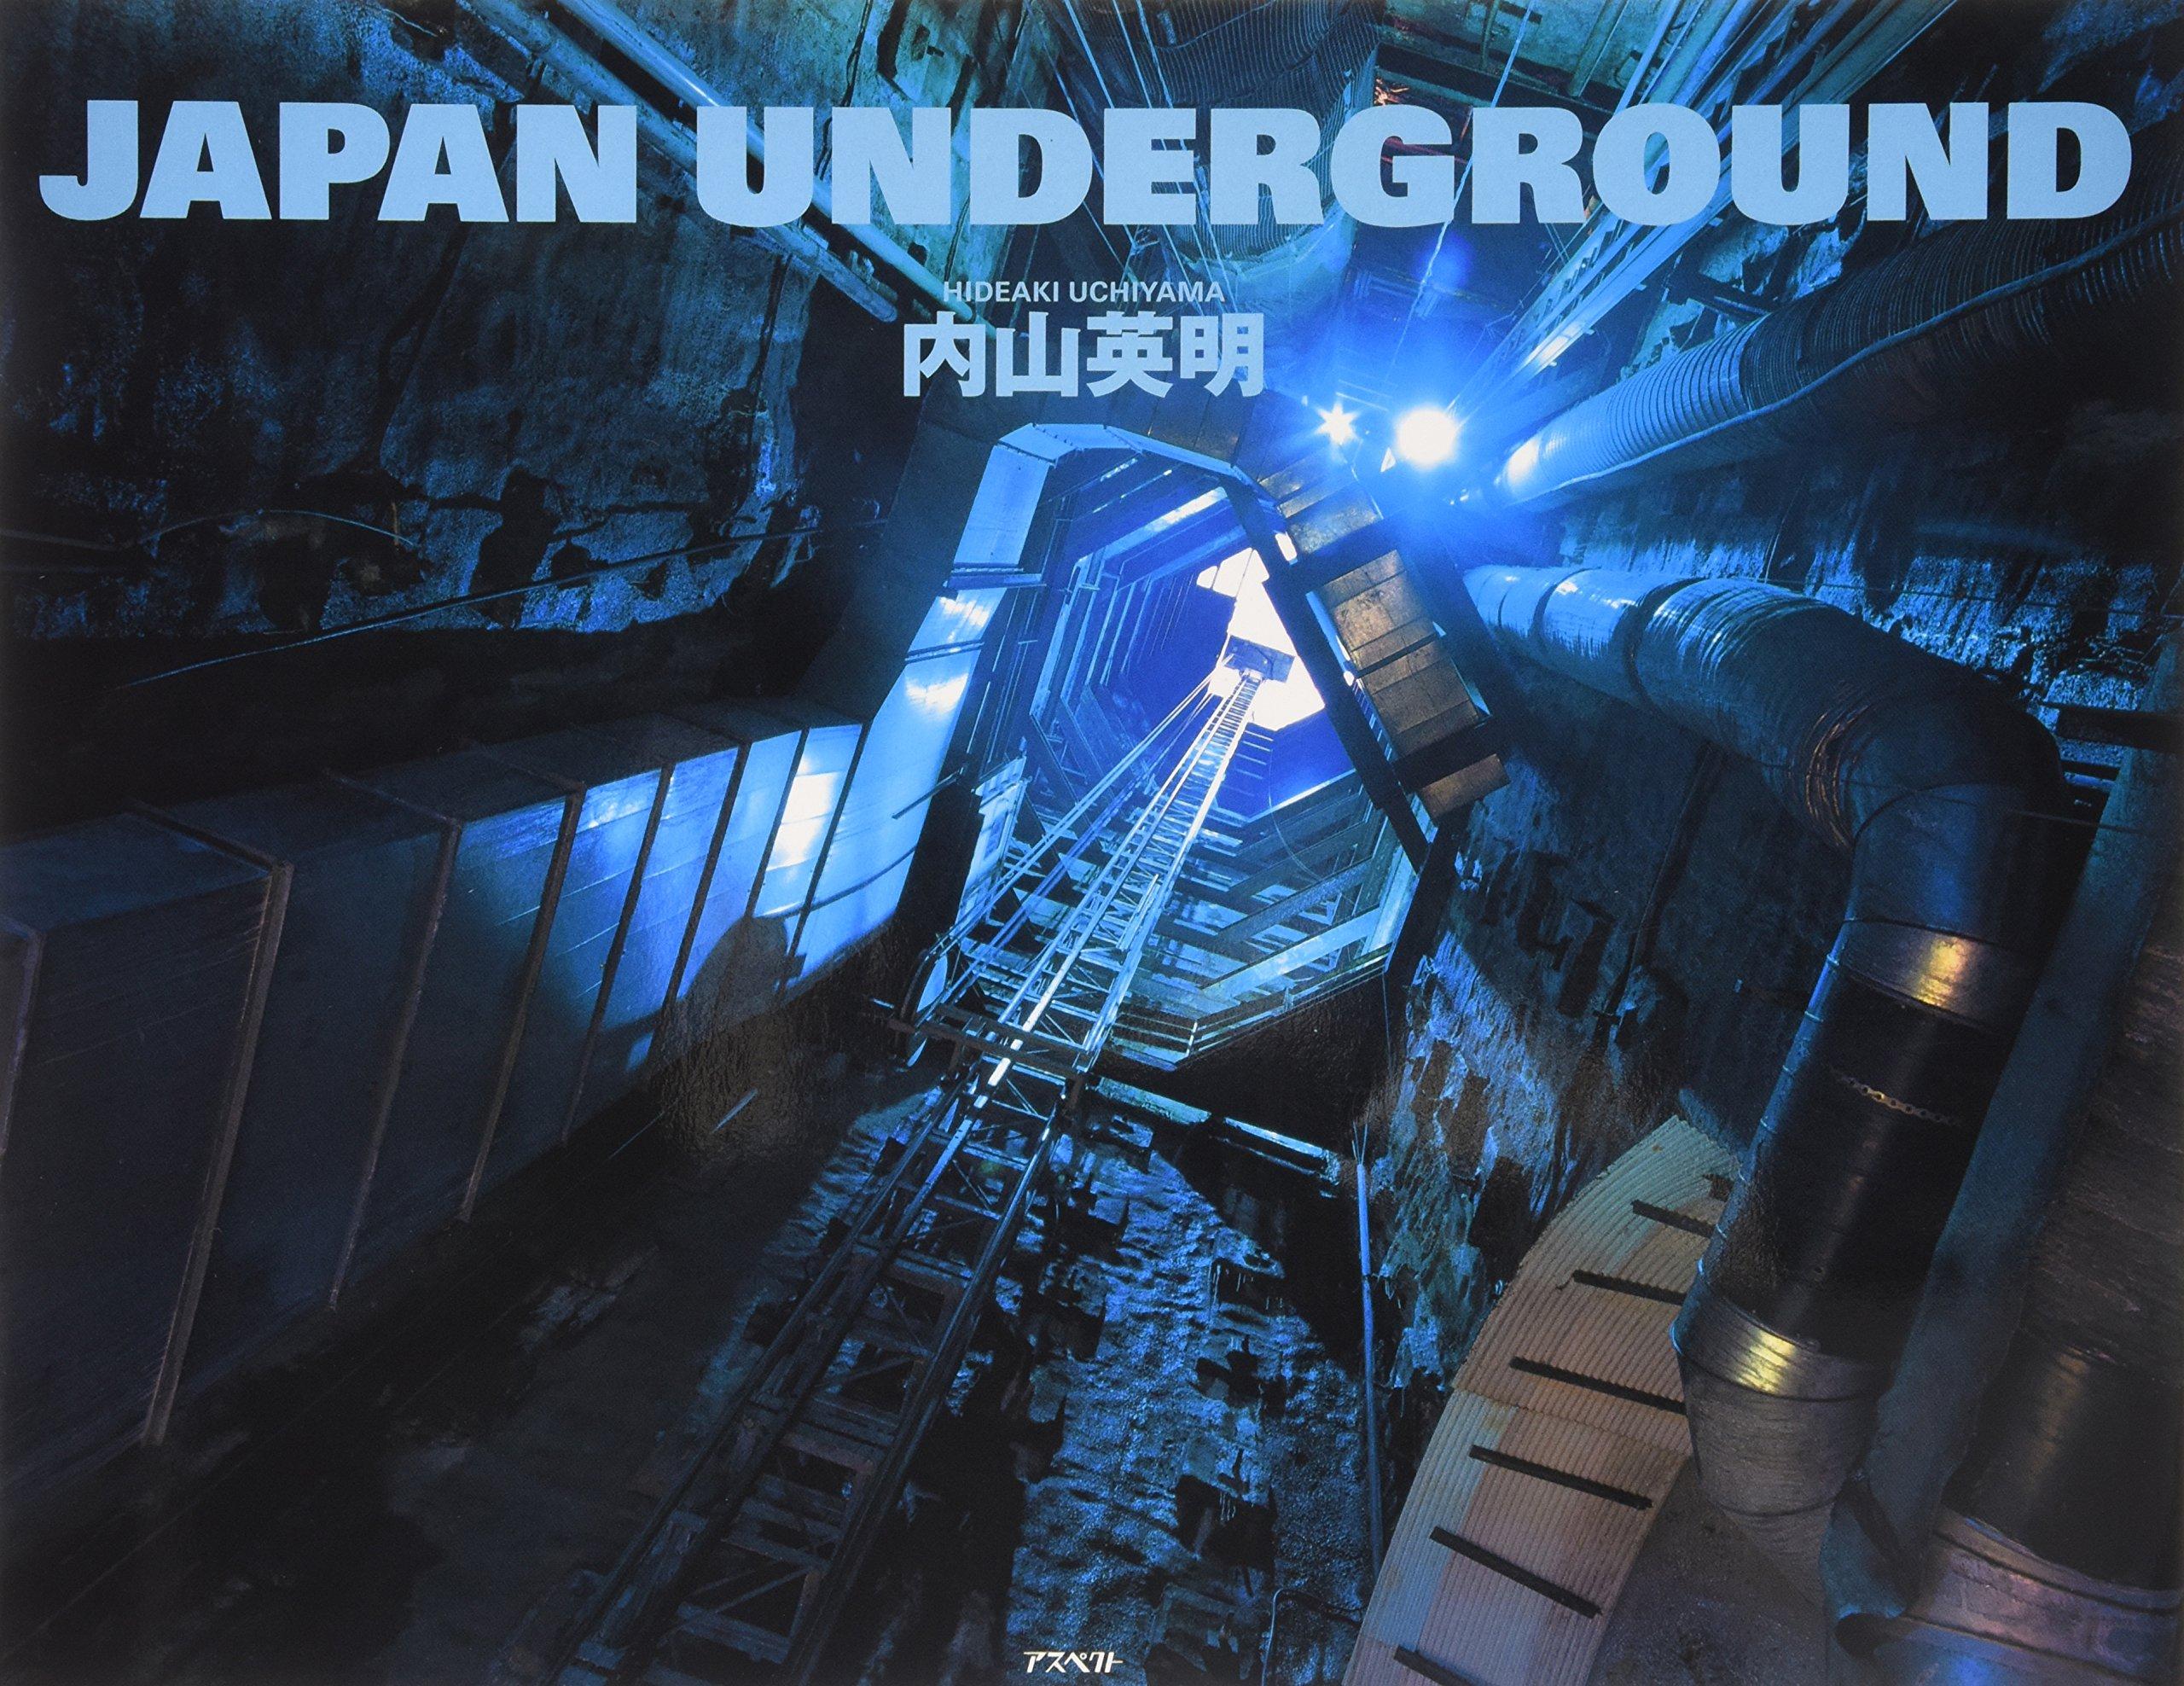 Amazon.com: JAPAN UNDERGROUND (9784757207745): Hideaki Uchiyama: Books